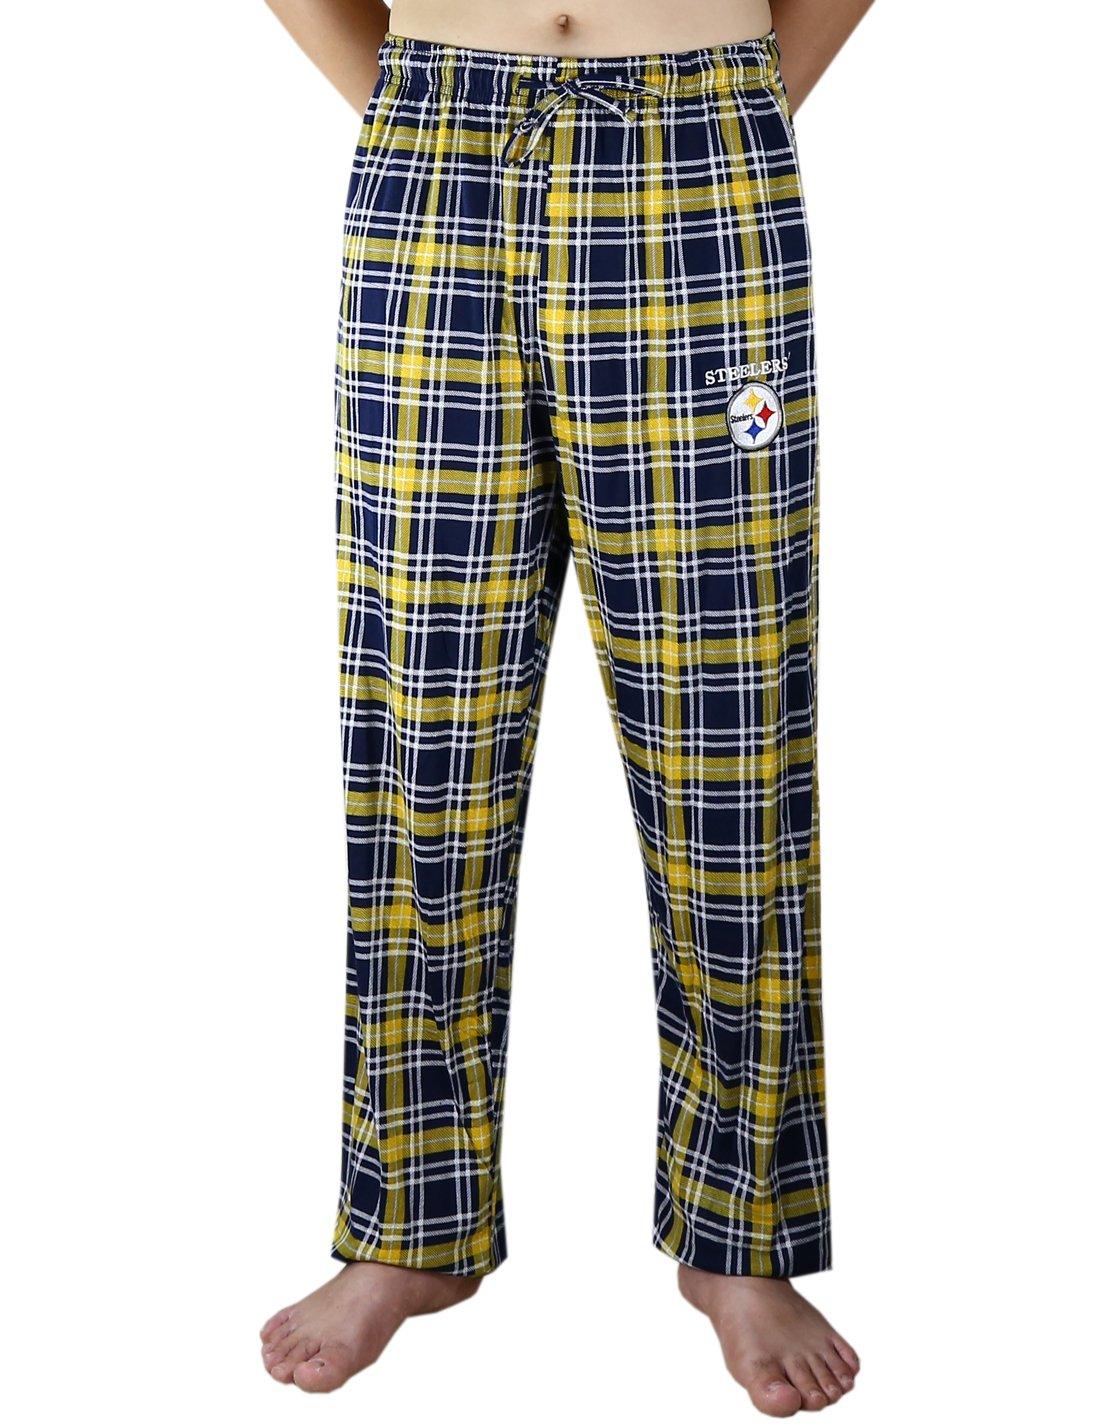 KANISA Pit Steelers Mens 100% Cotton Plaid Pajama/Sleepwear Pants - Multicolor Size M by KANISA (Image #1)